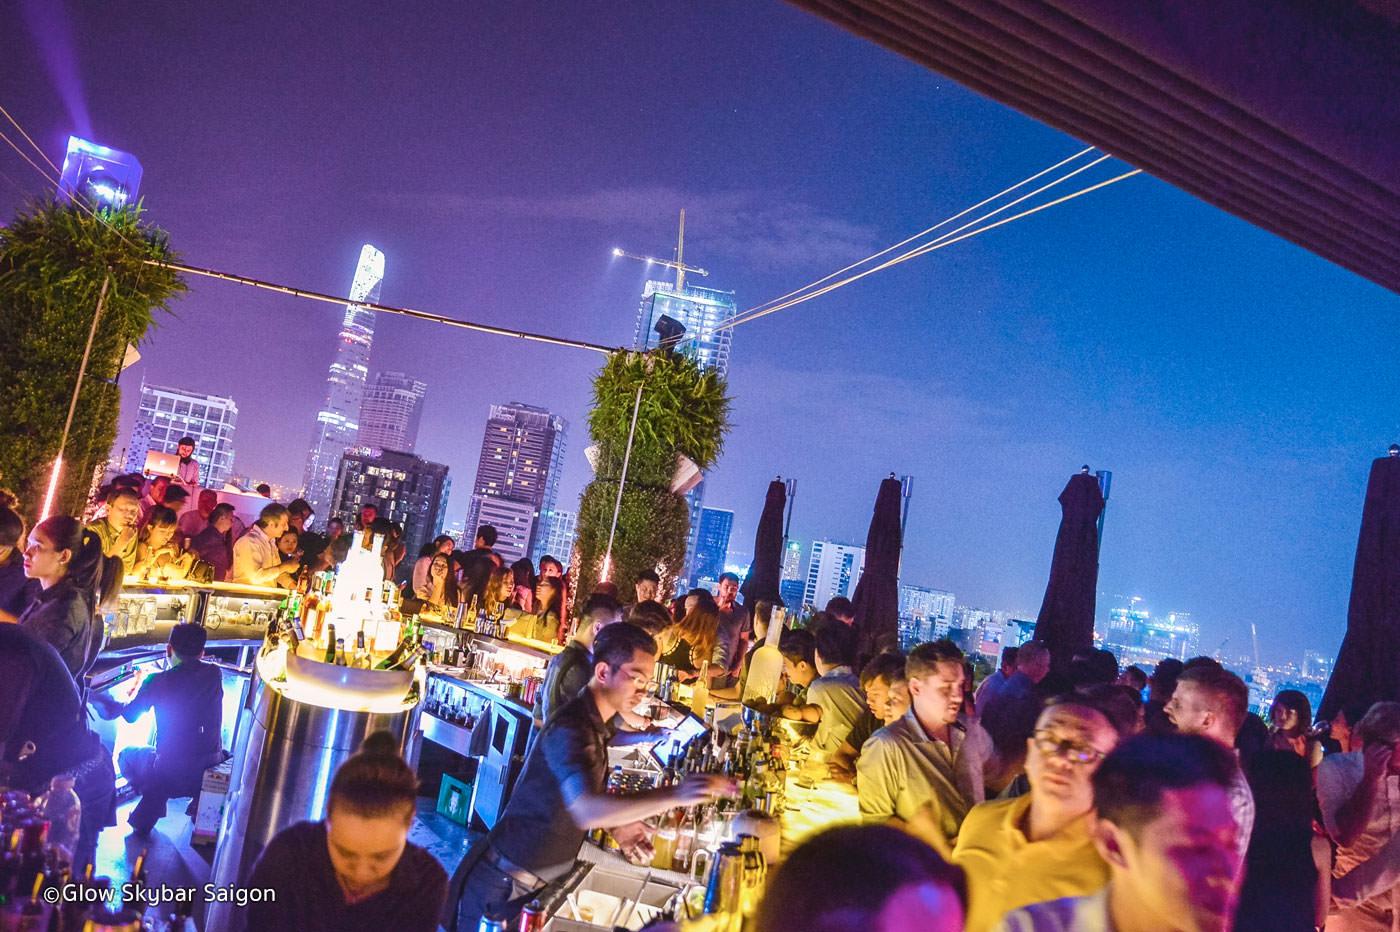 Saigon Rooftop Bar